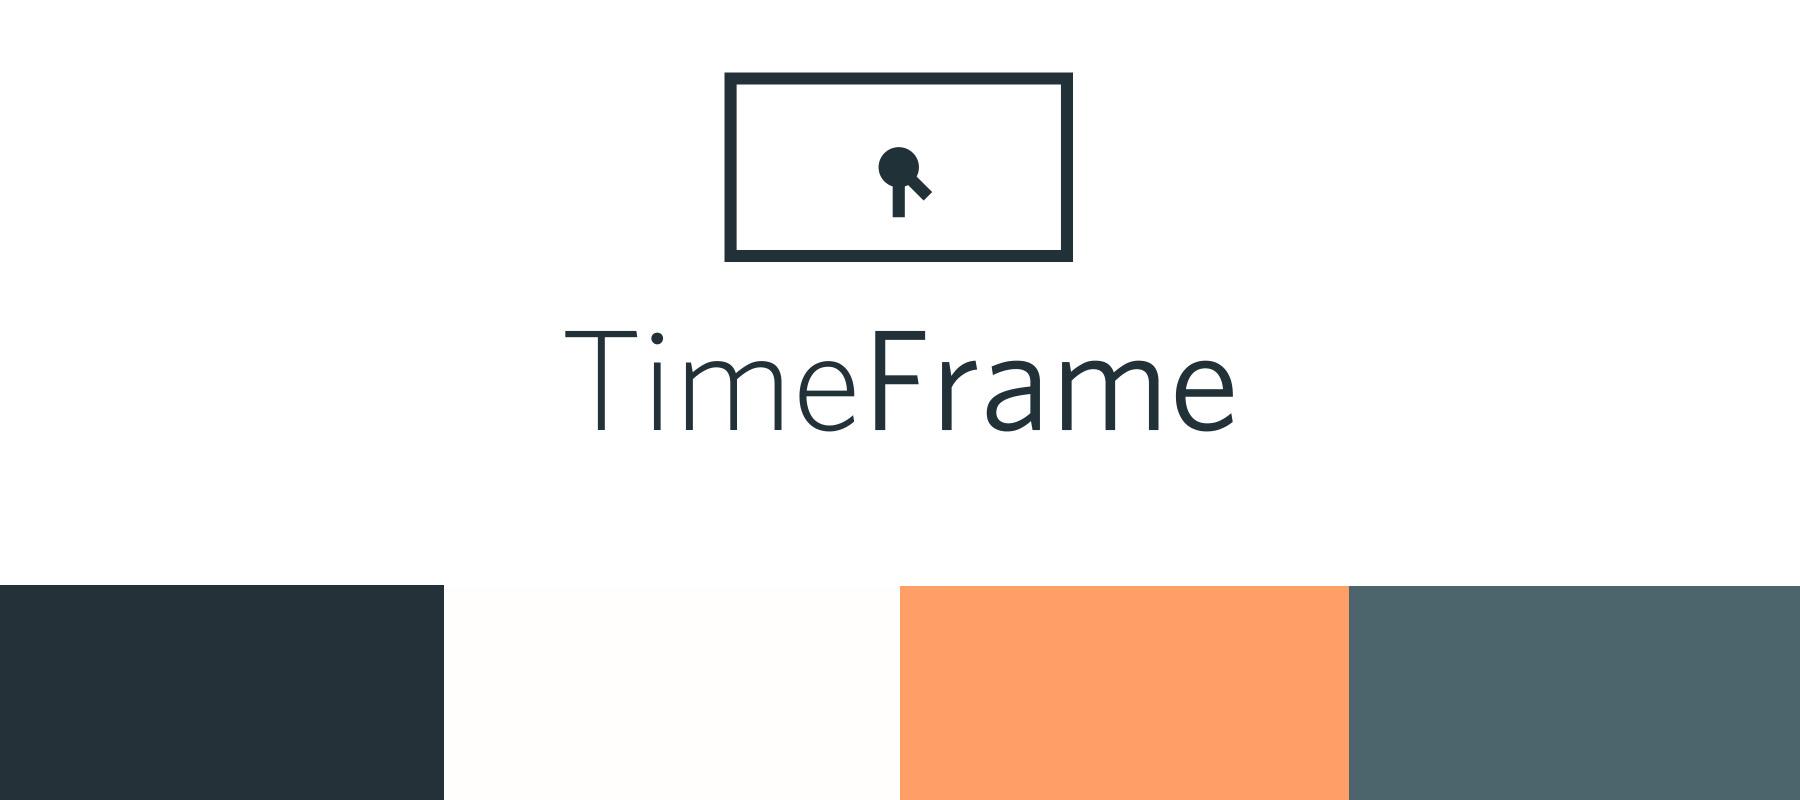 TimeFrame Brand